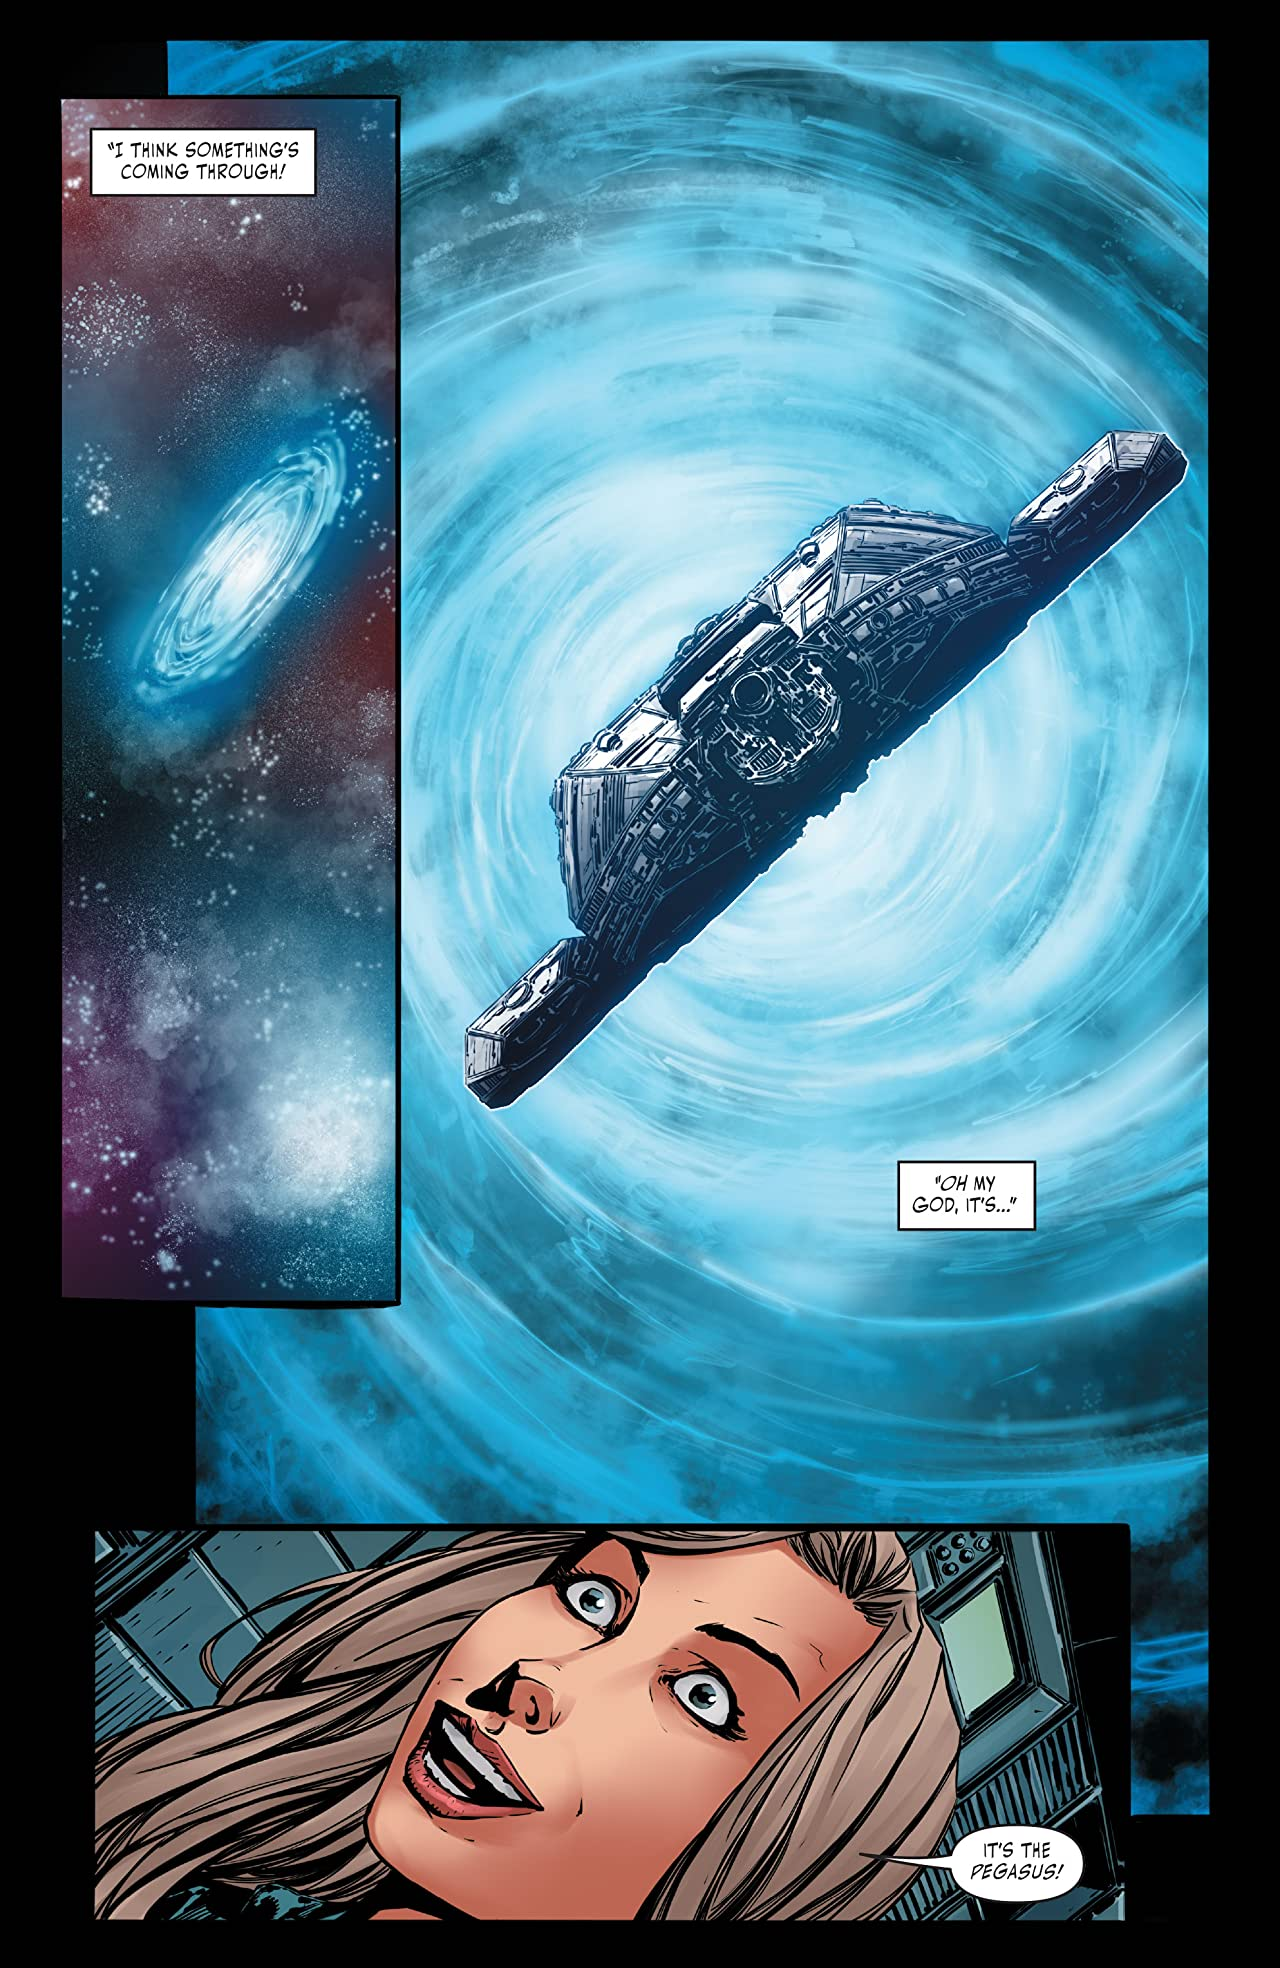 Battlestar Galactica Vs. Battlestar Galactica #3